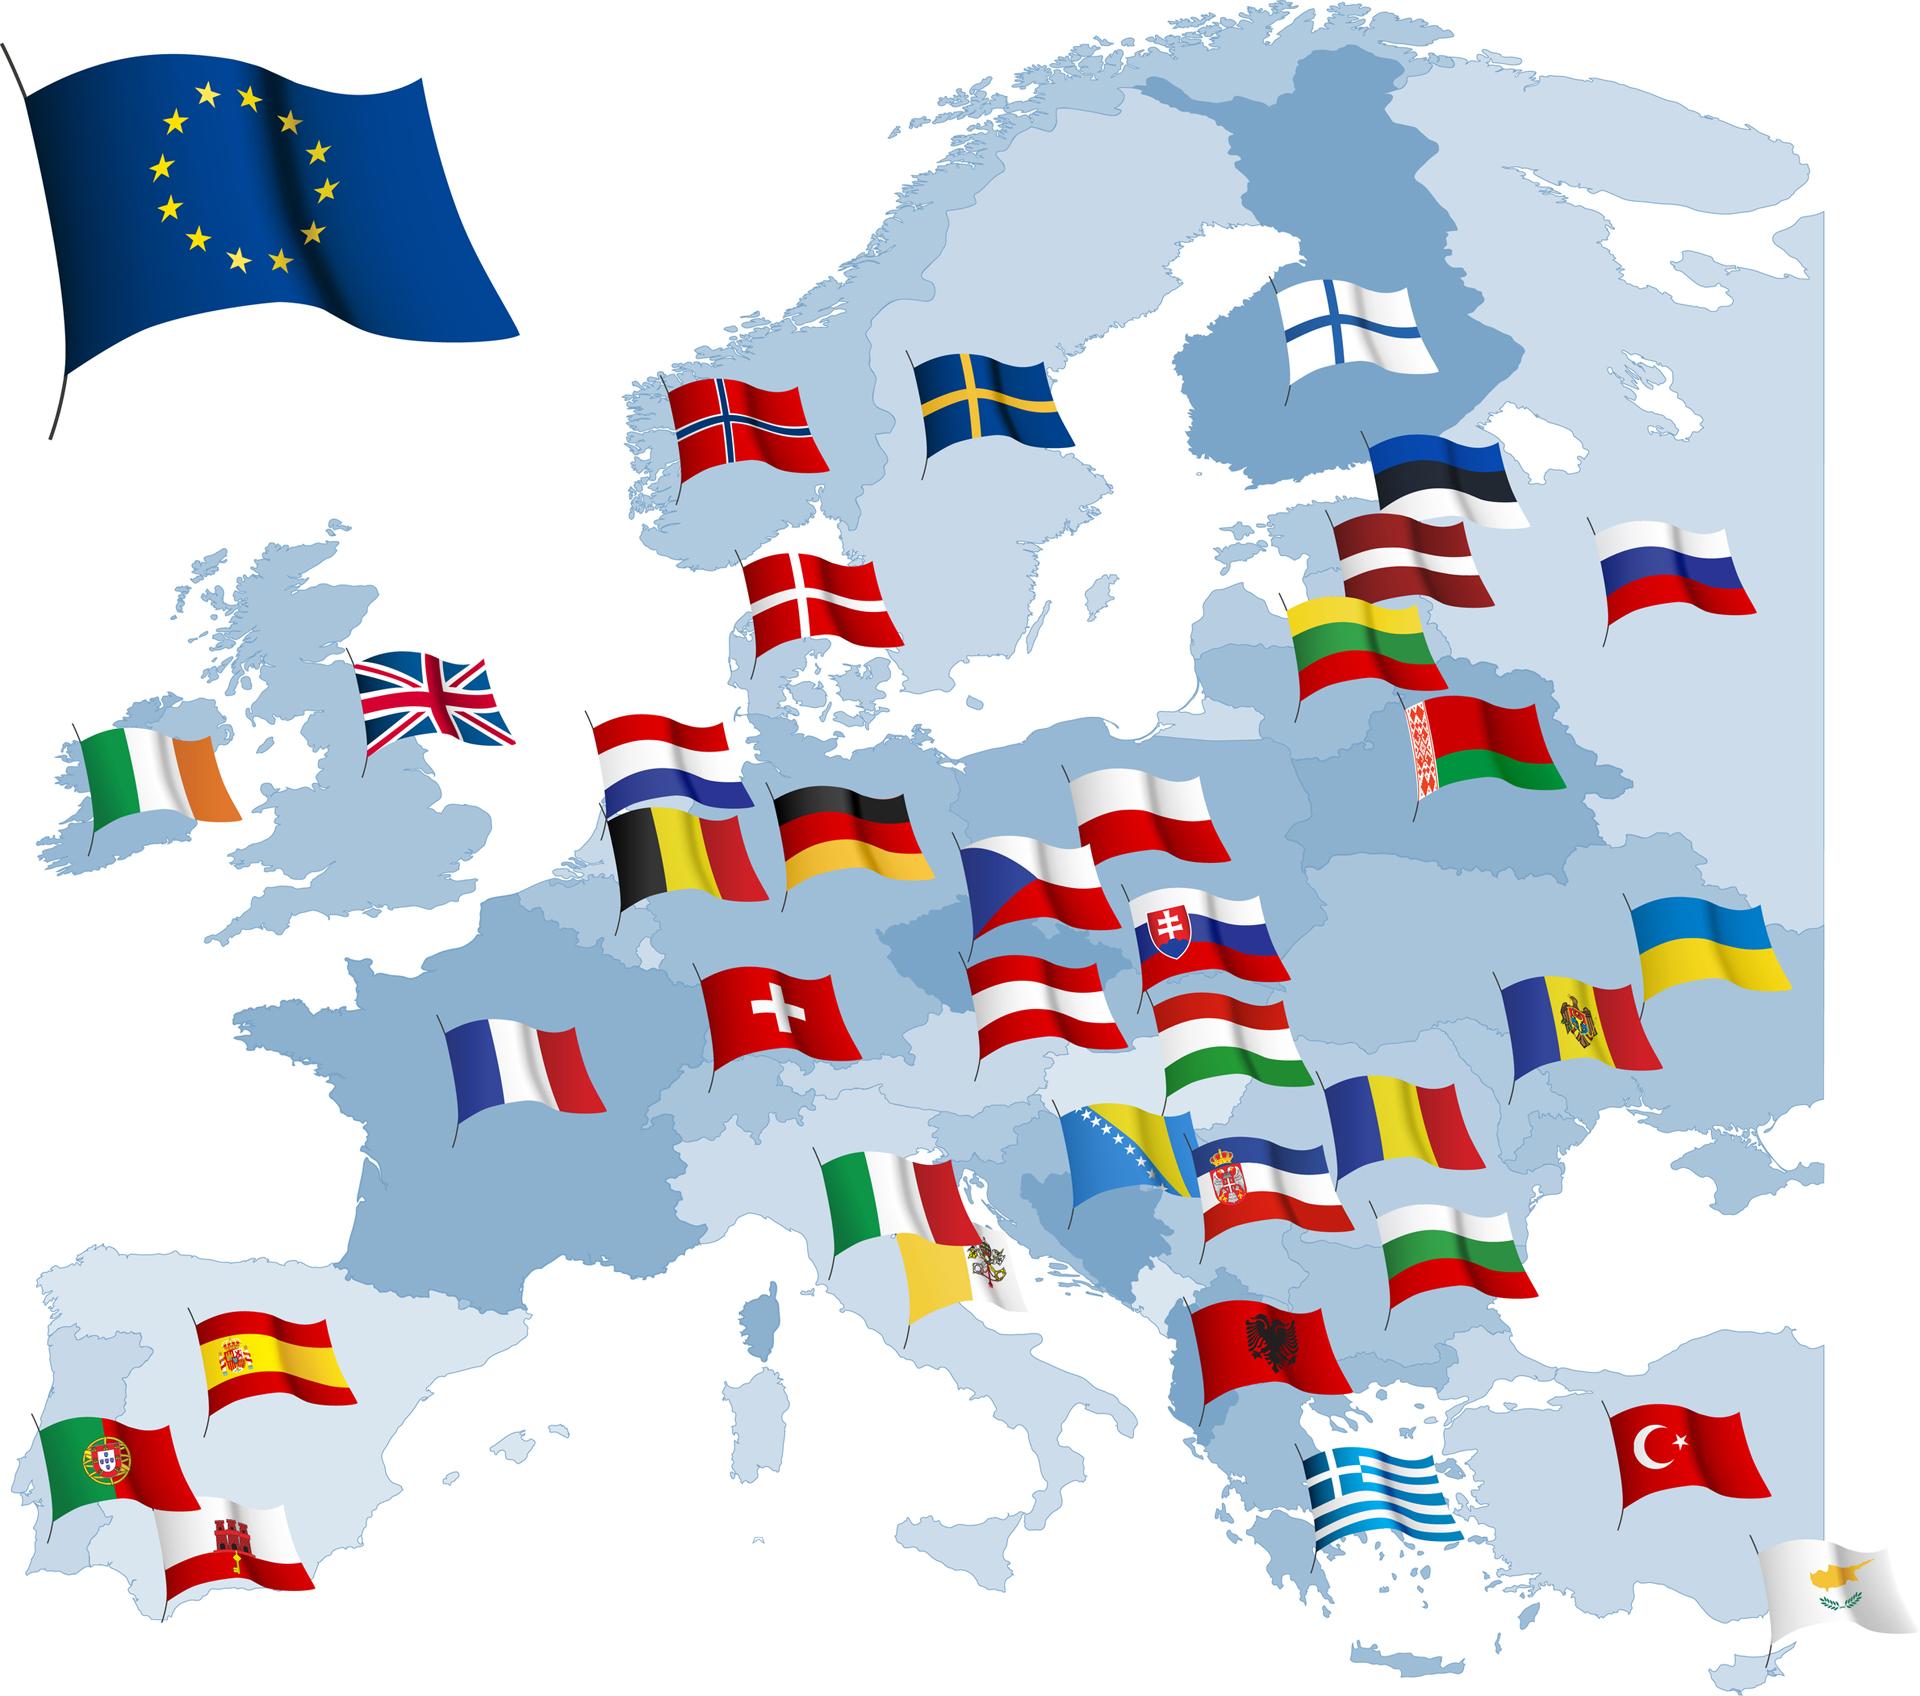 Road Transport Europe